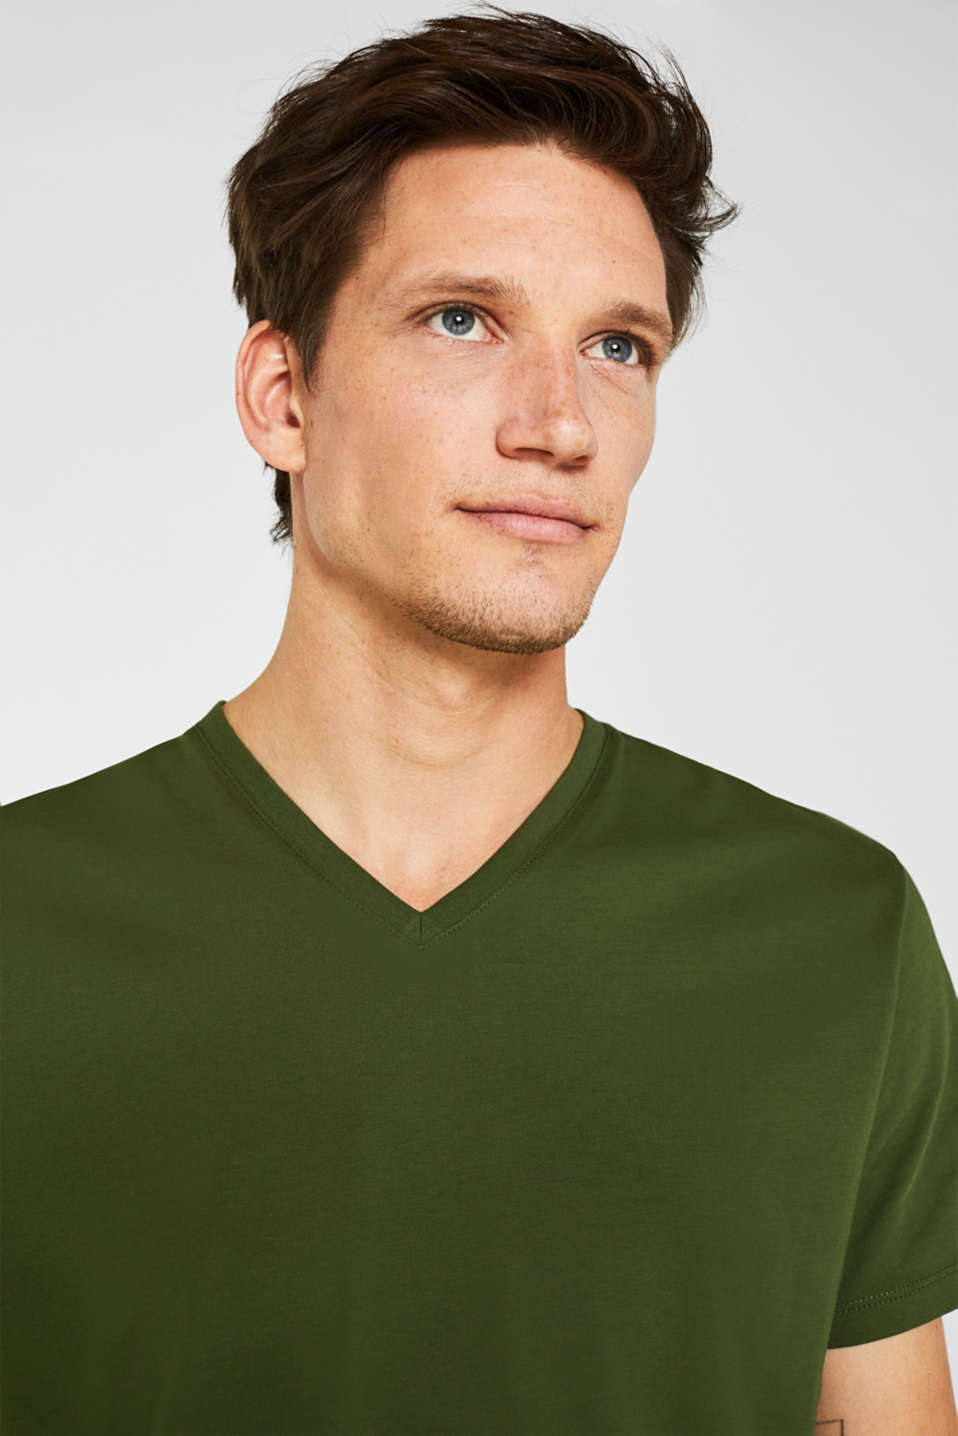 Jersey T-shirt in 100% cotton, KHAKI GREEN, detail image number 6